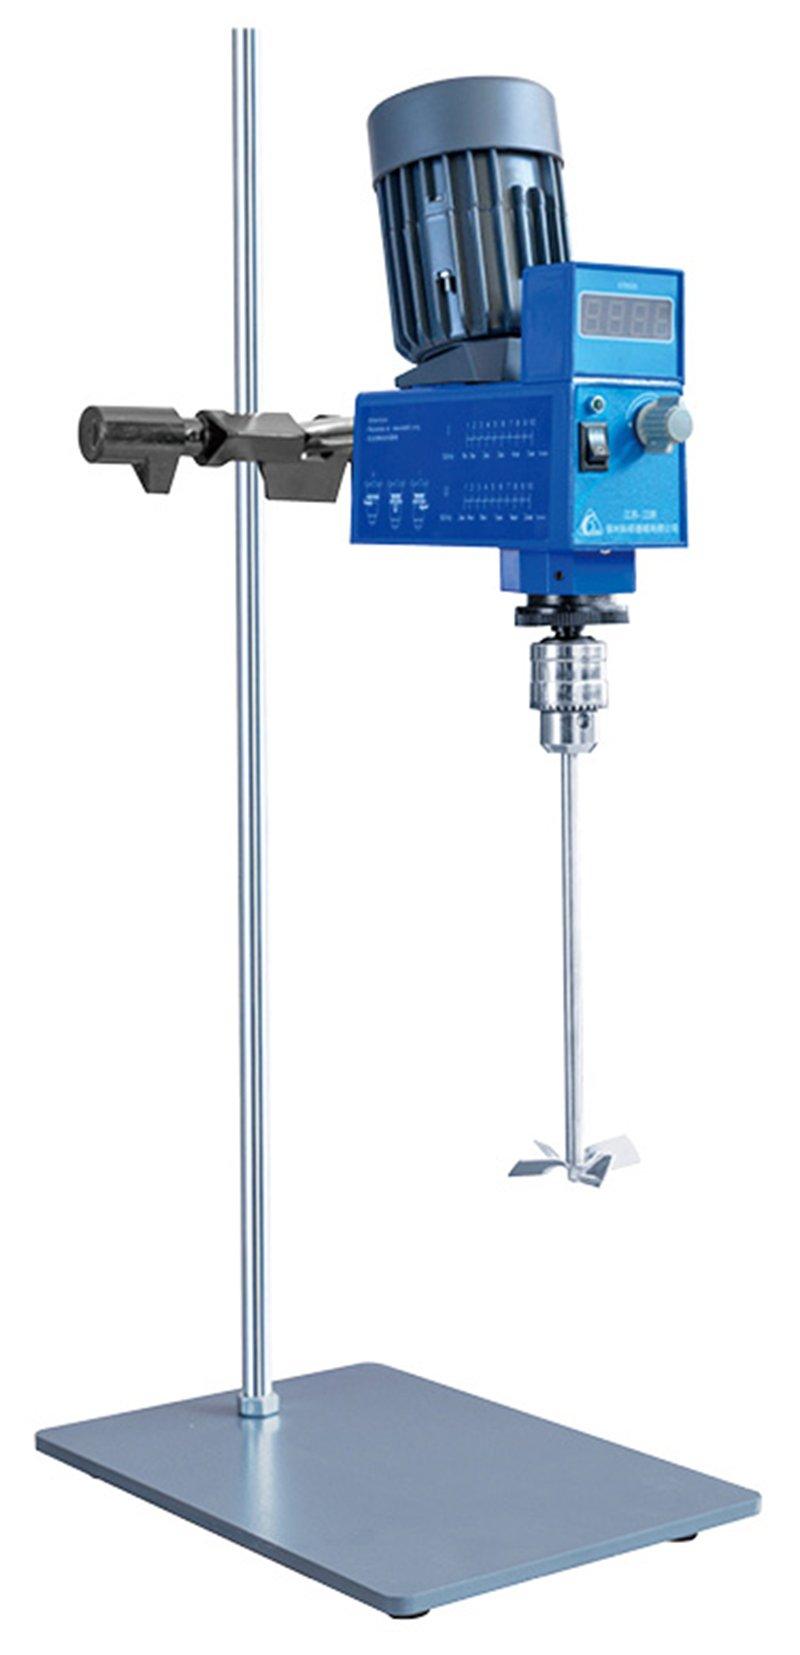 Top Digital Powerful Lab Stirrer mixer 2000RPM 20L 10000mPas 110V by XZB (Image #1)